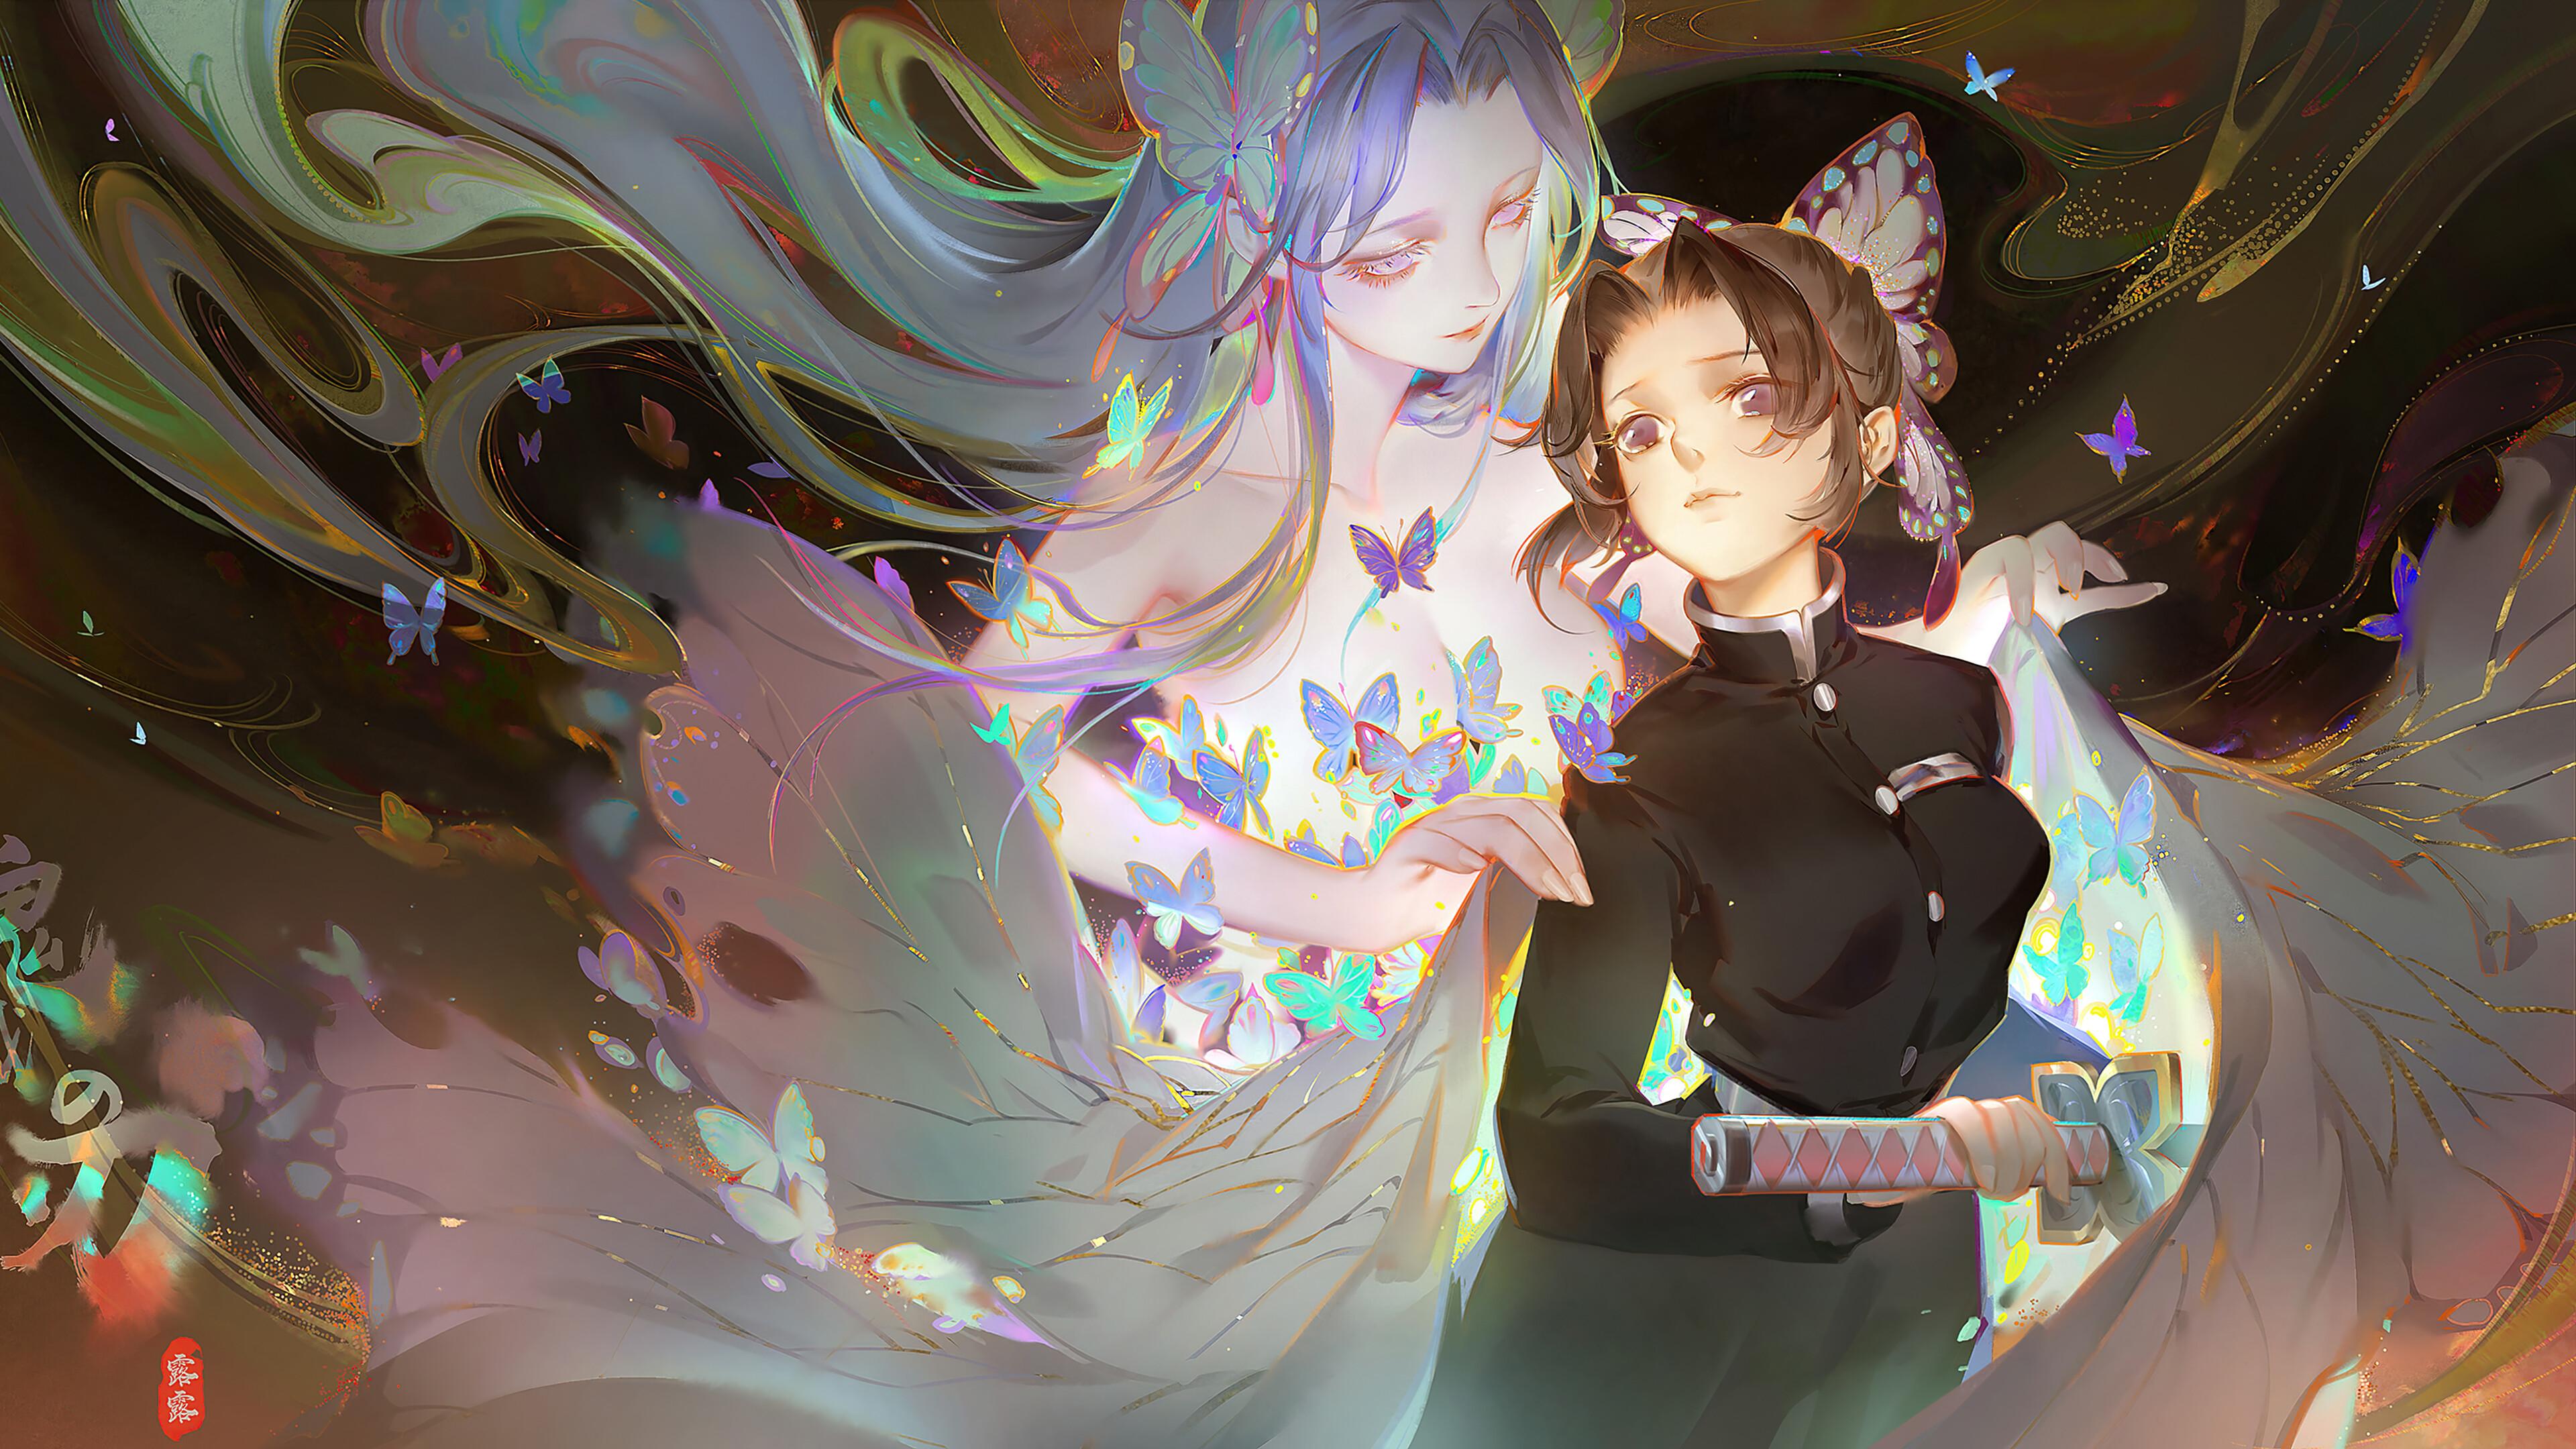 Shinobu Kocho Kimetsu no Yaiba Wallpaper, HD Anime 4K Wallpapers, Images, Photos and Background